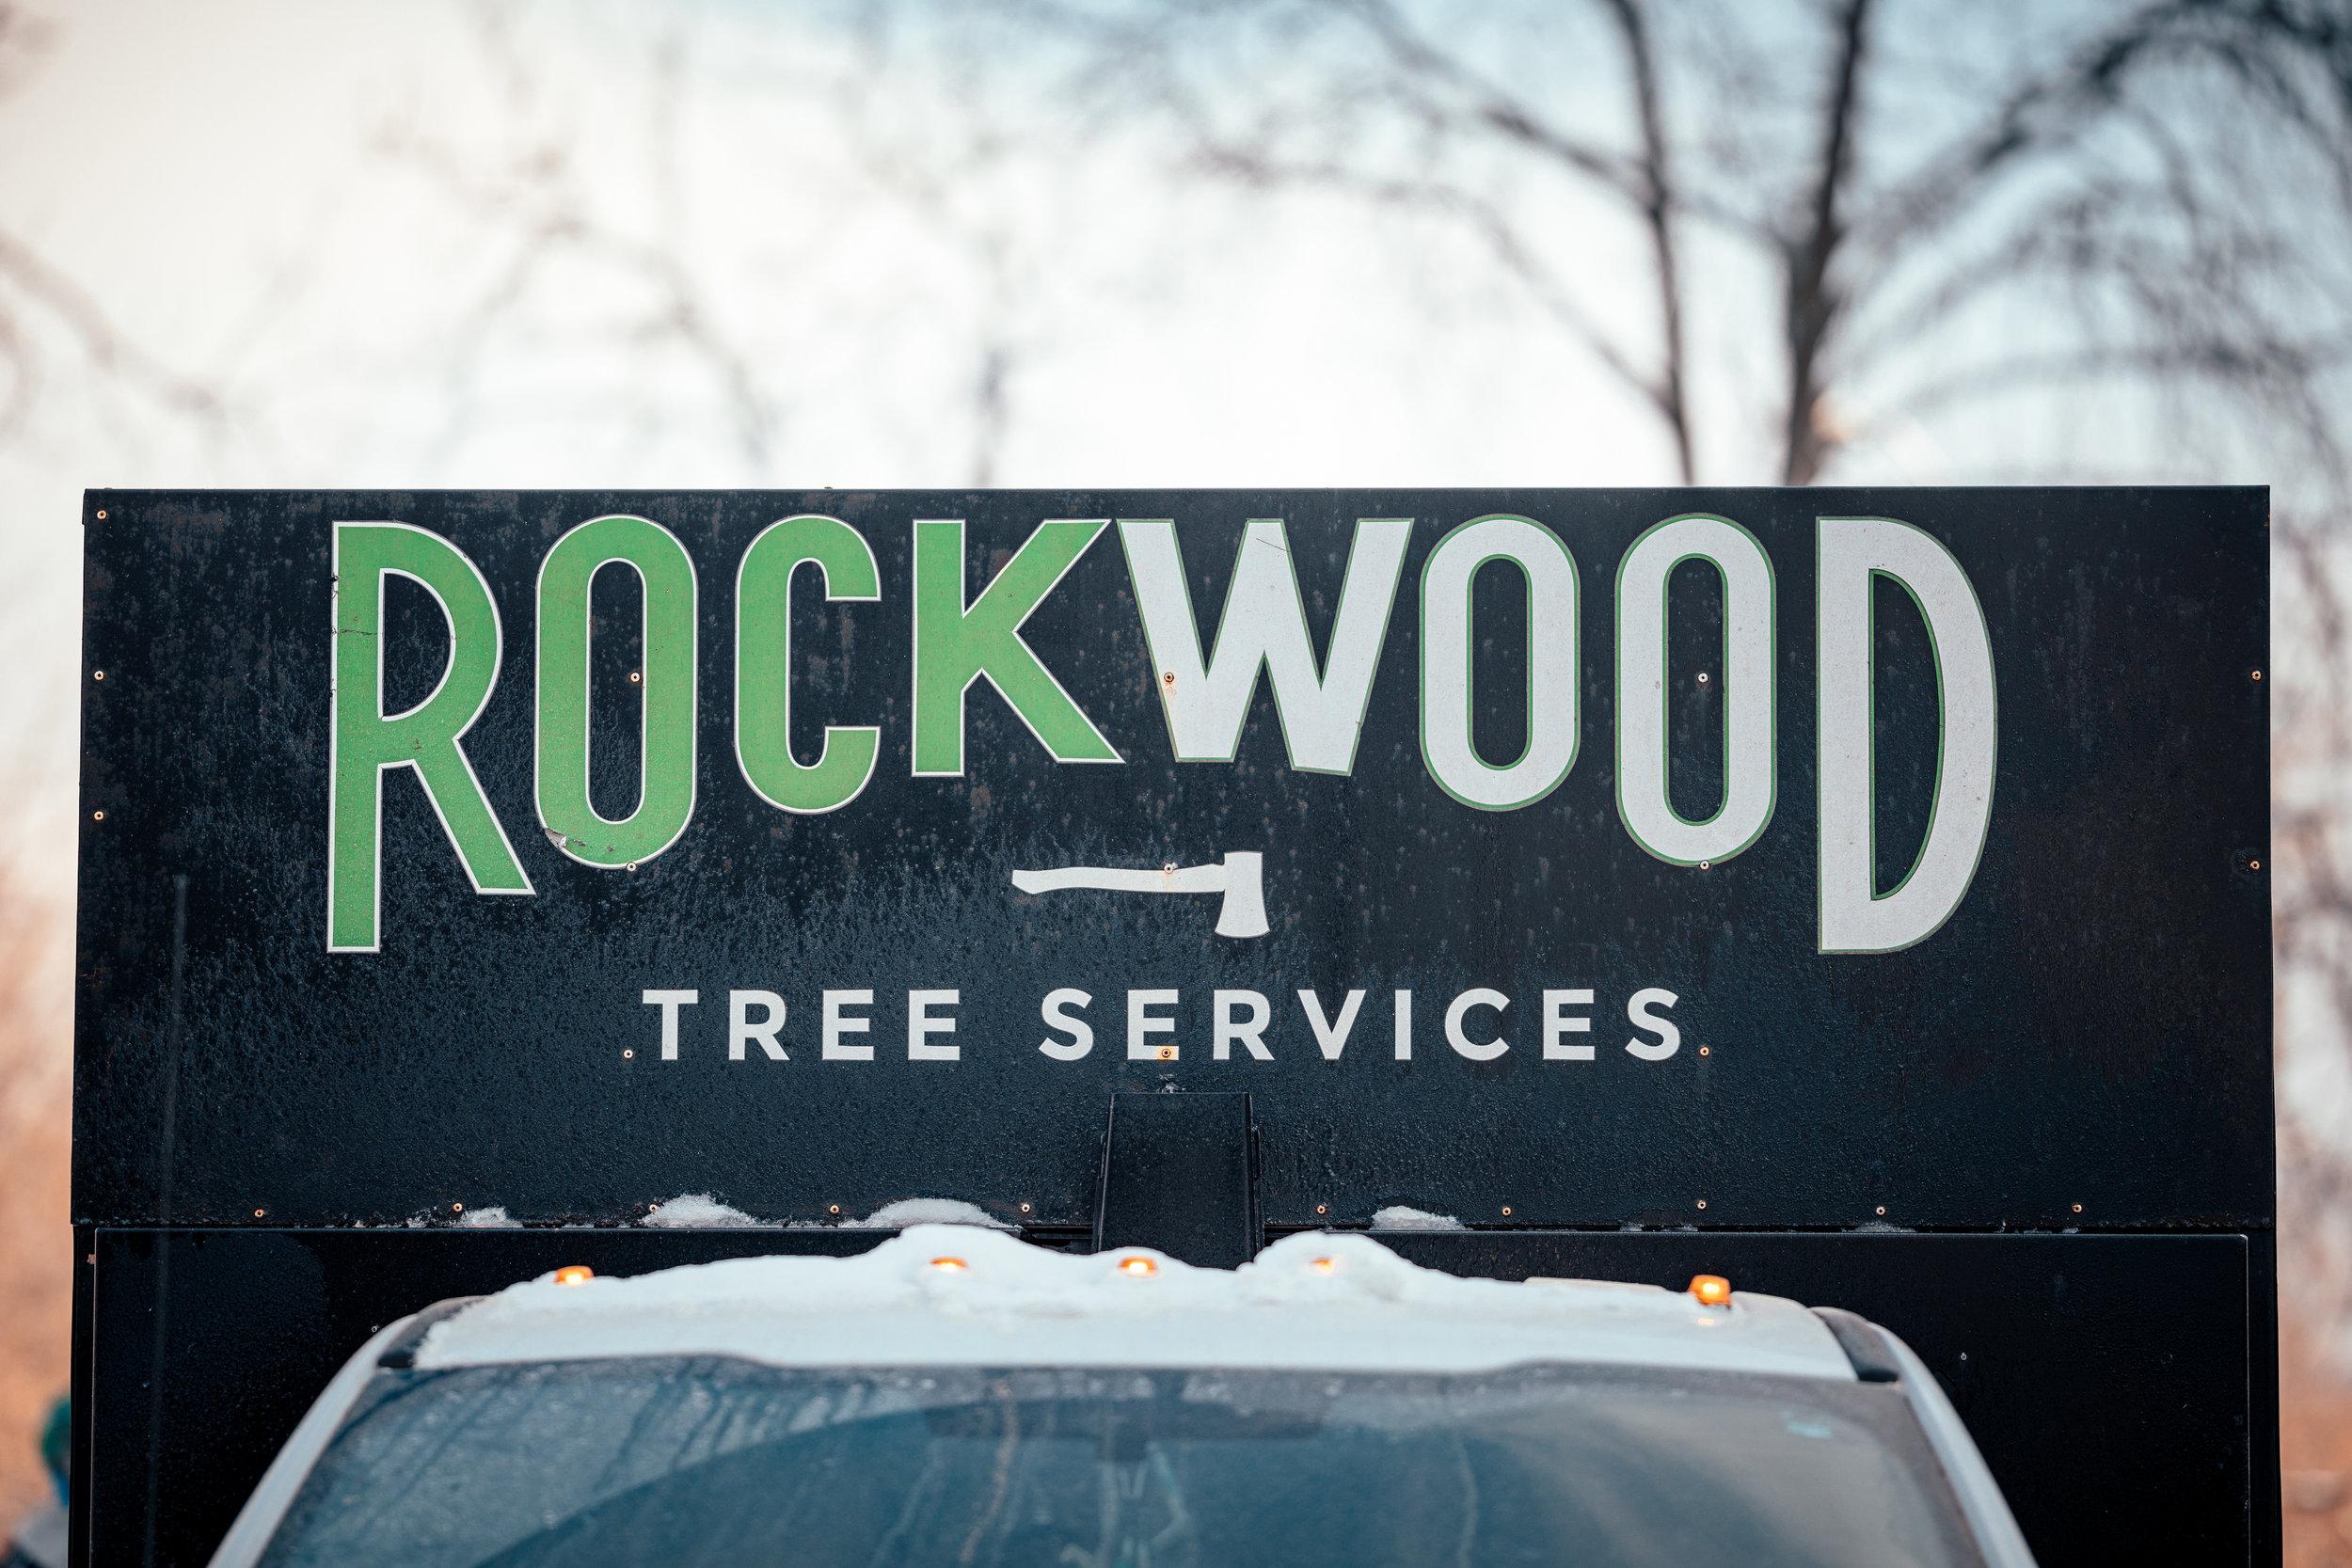 Rockwood Tree Services Toronto (81).jpg